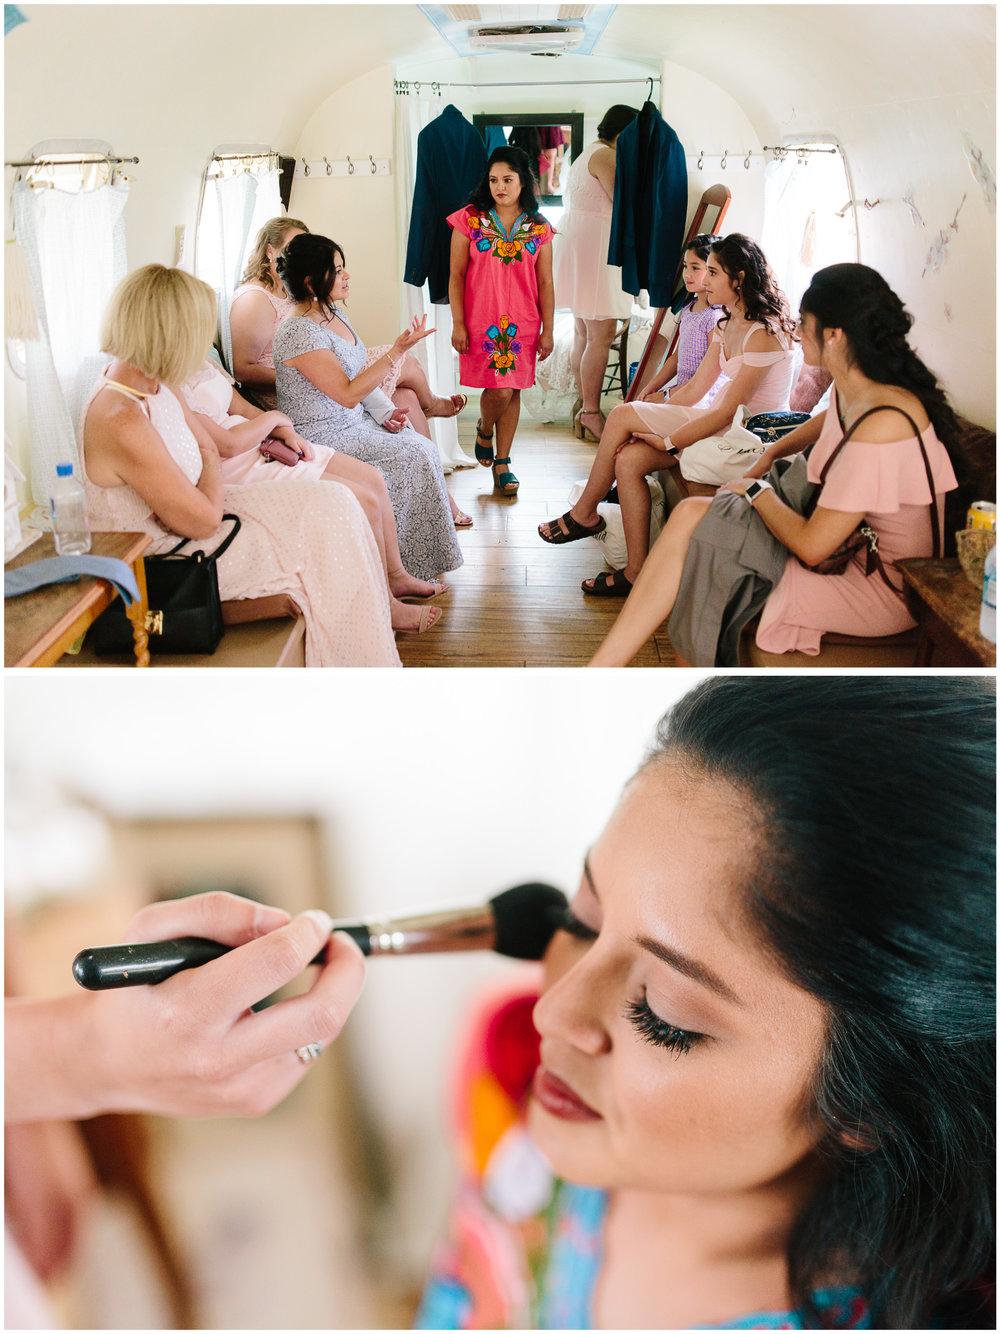 lyons_farmette_wedding_4.jpg